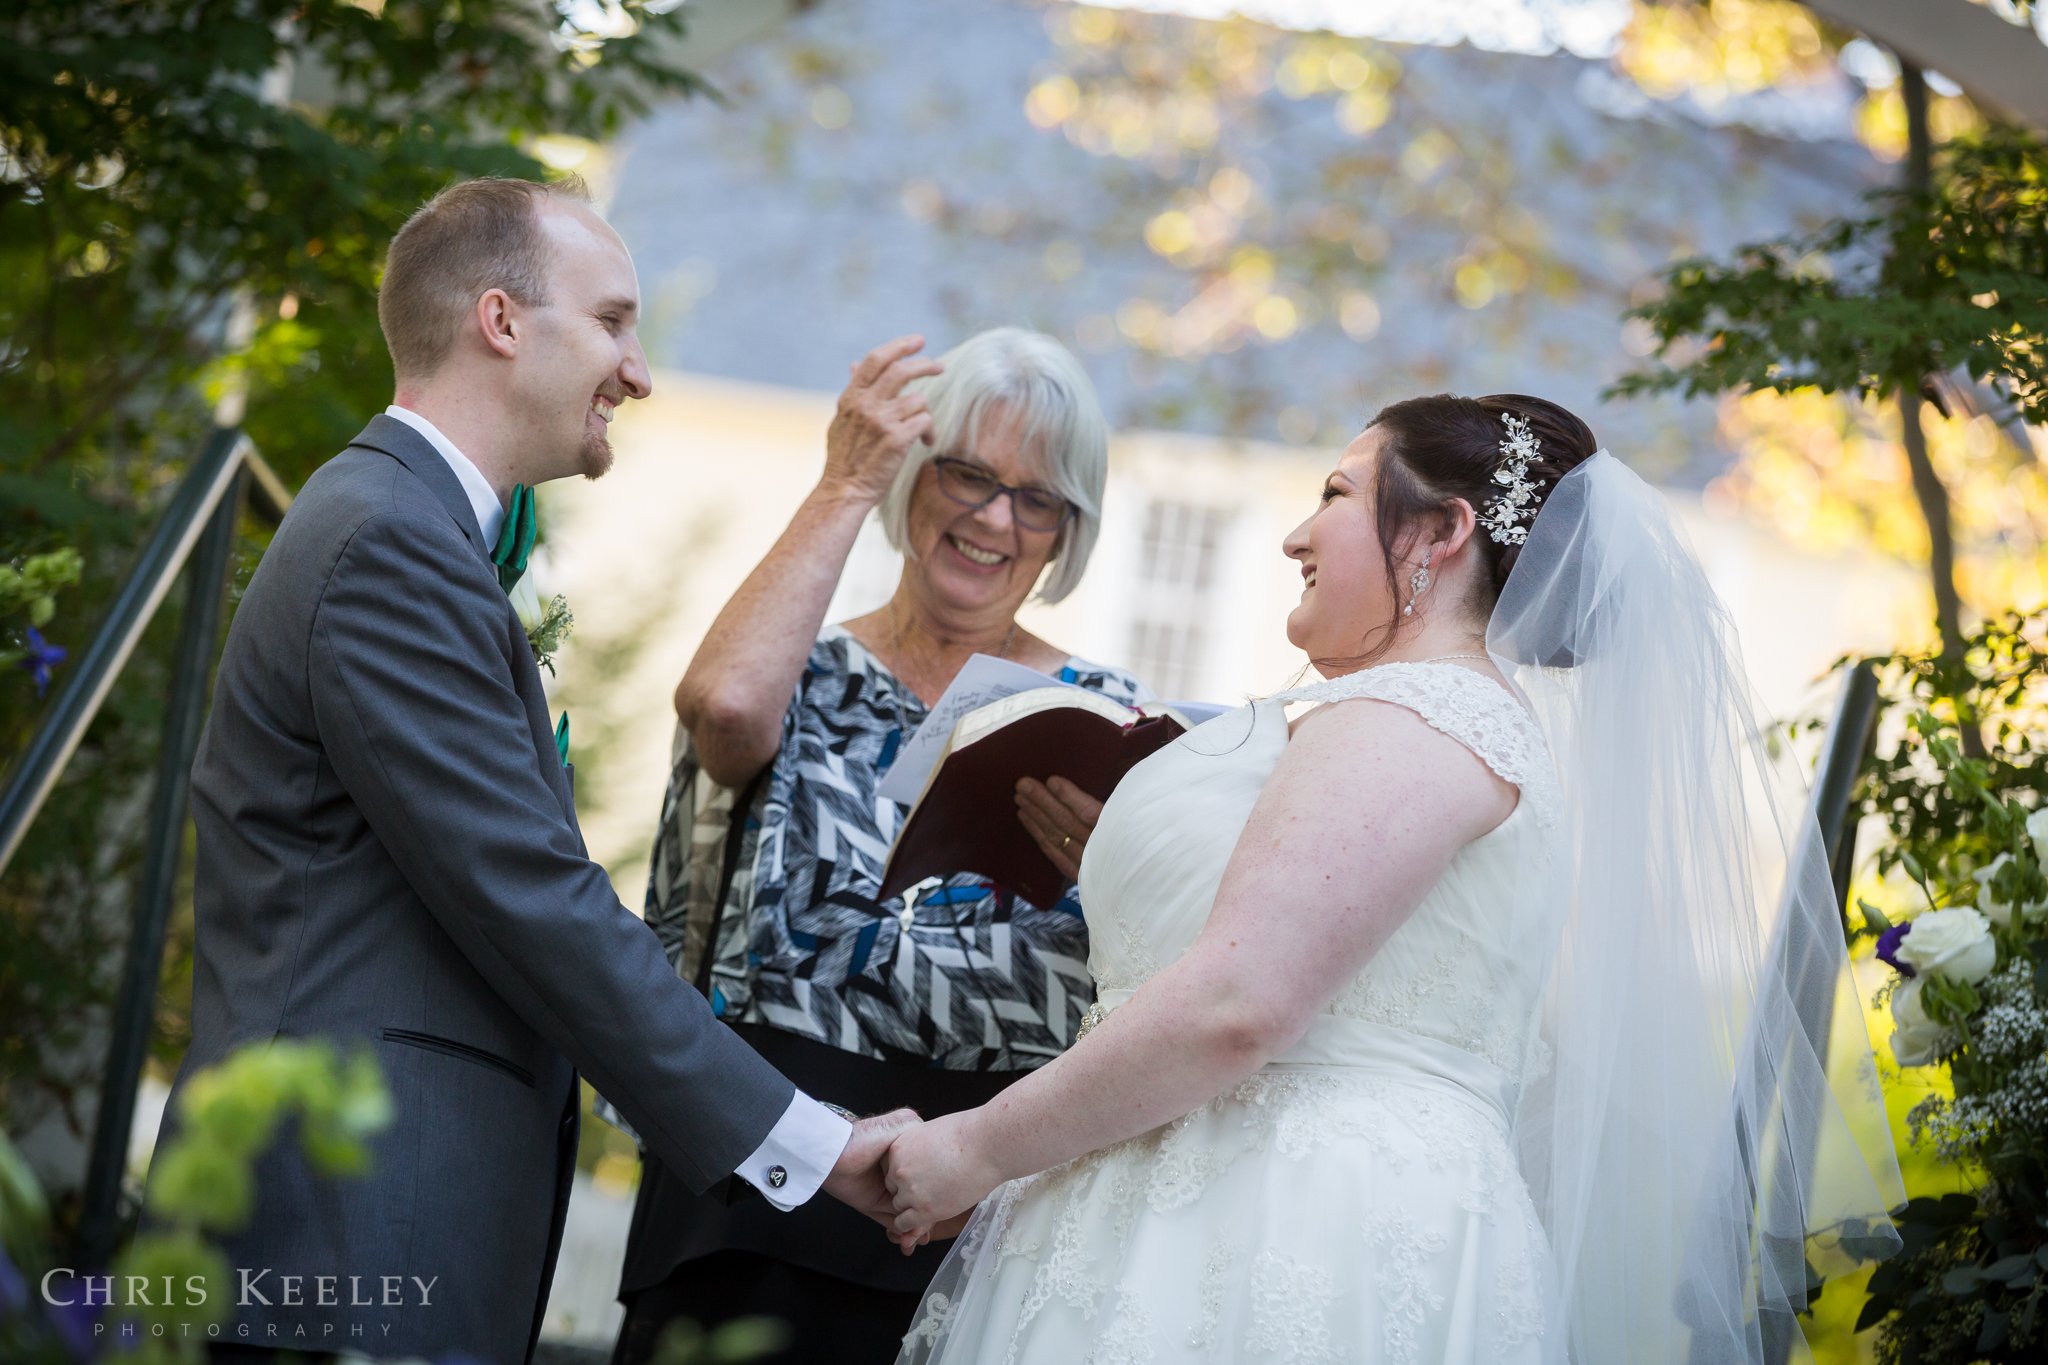 new-hampshire-wedding-photographer-three-chimneys-inn-chris-keeley-photography-15.jpg